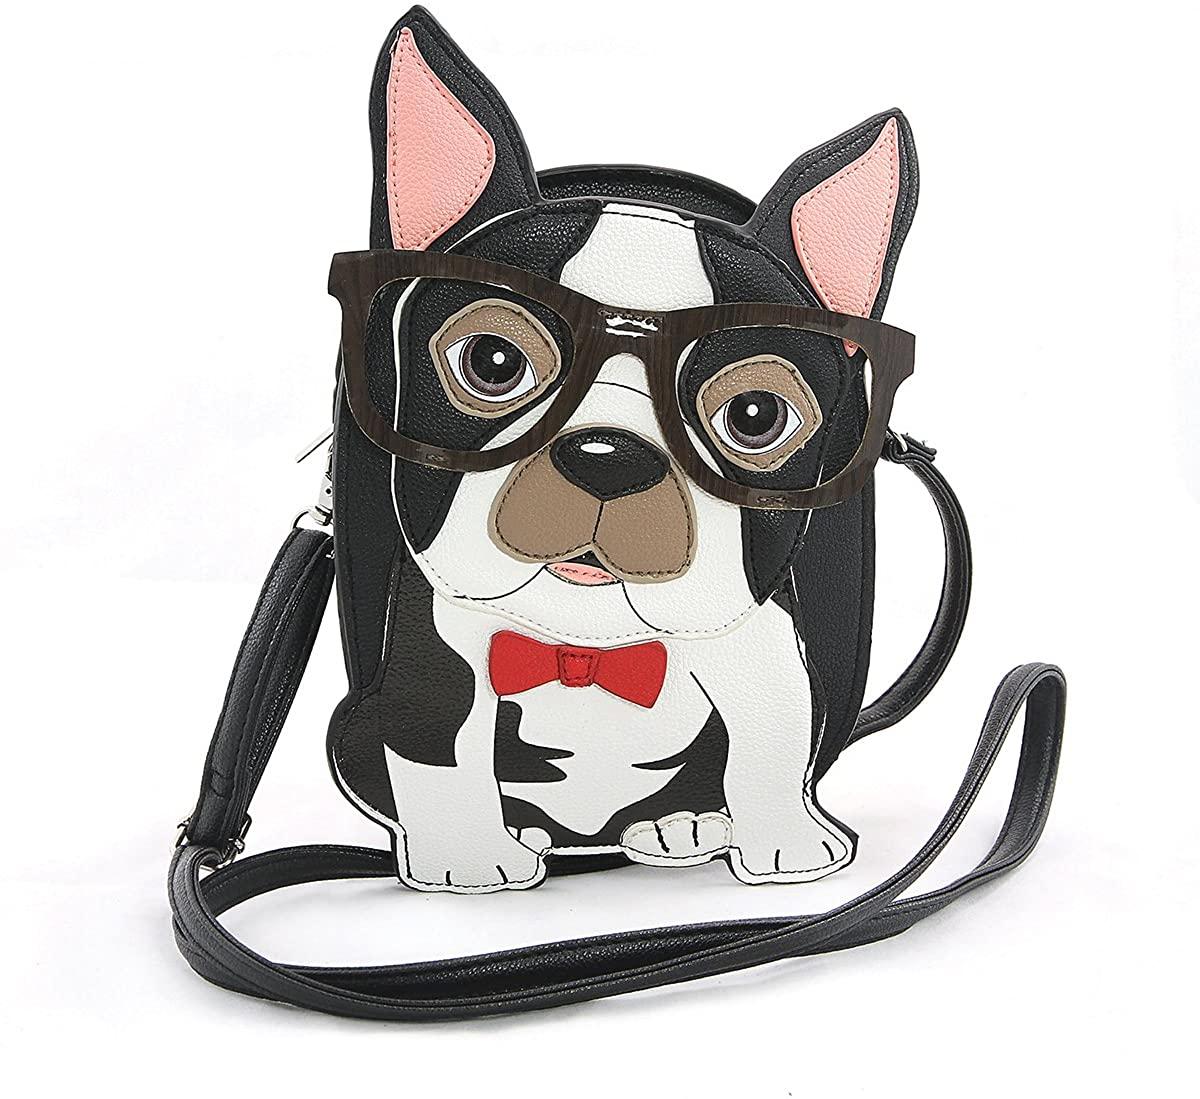 Sleepyville Critters Nerdy Boston Terrier Crossbody Bag On Vinyl